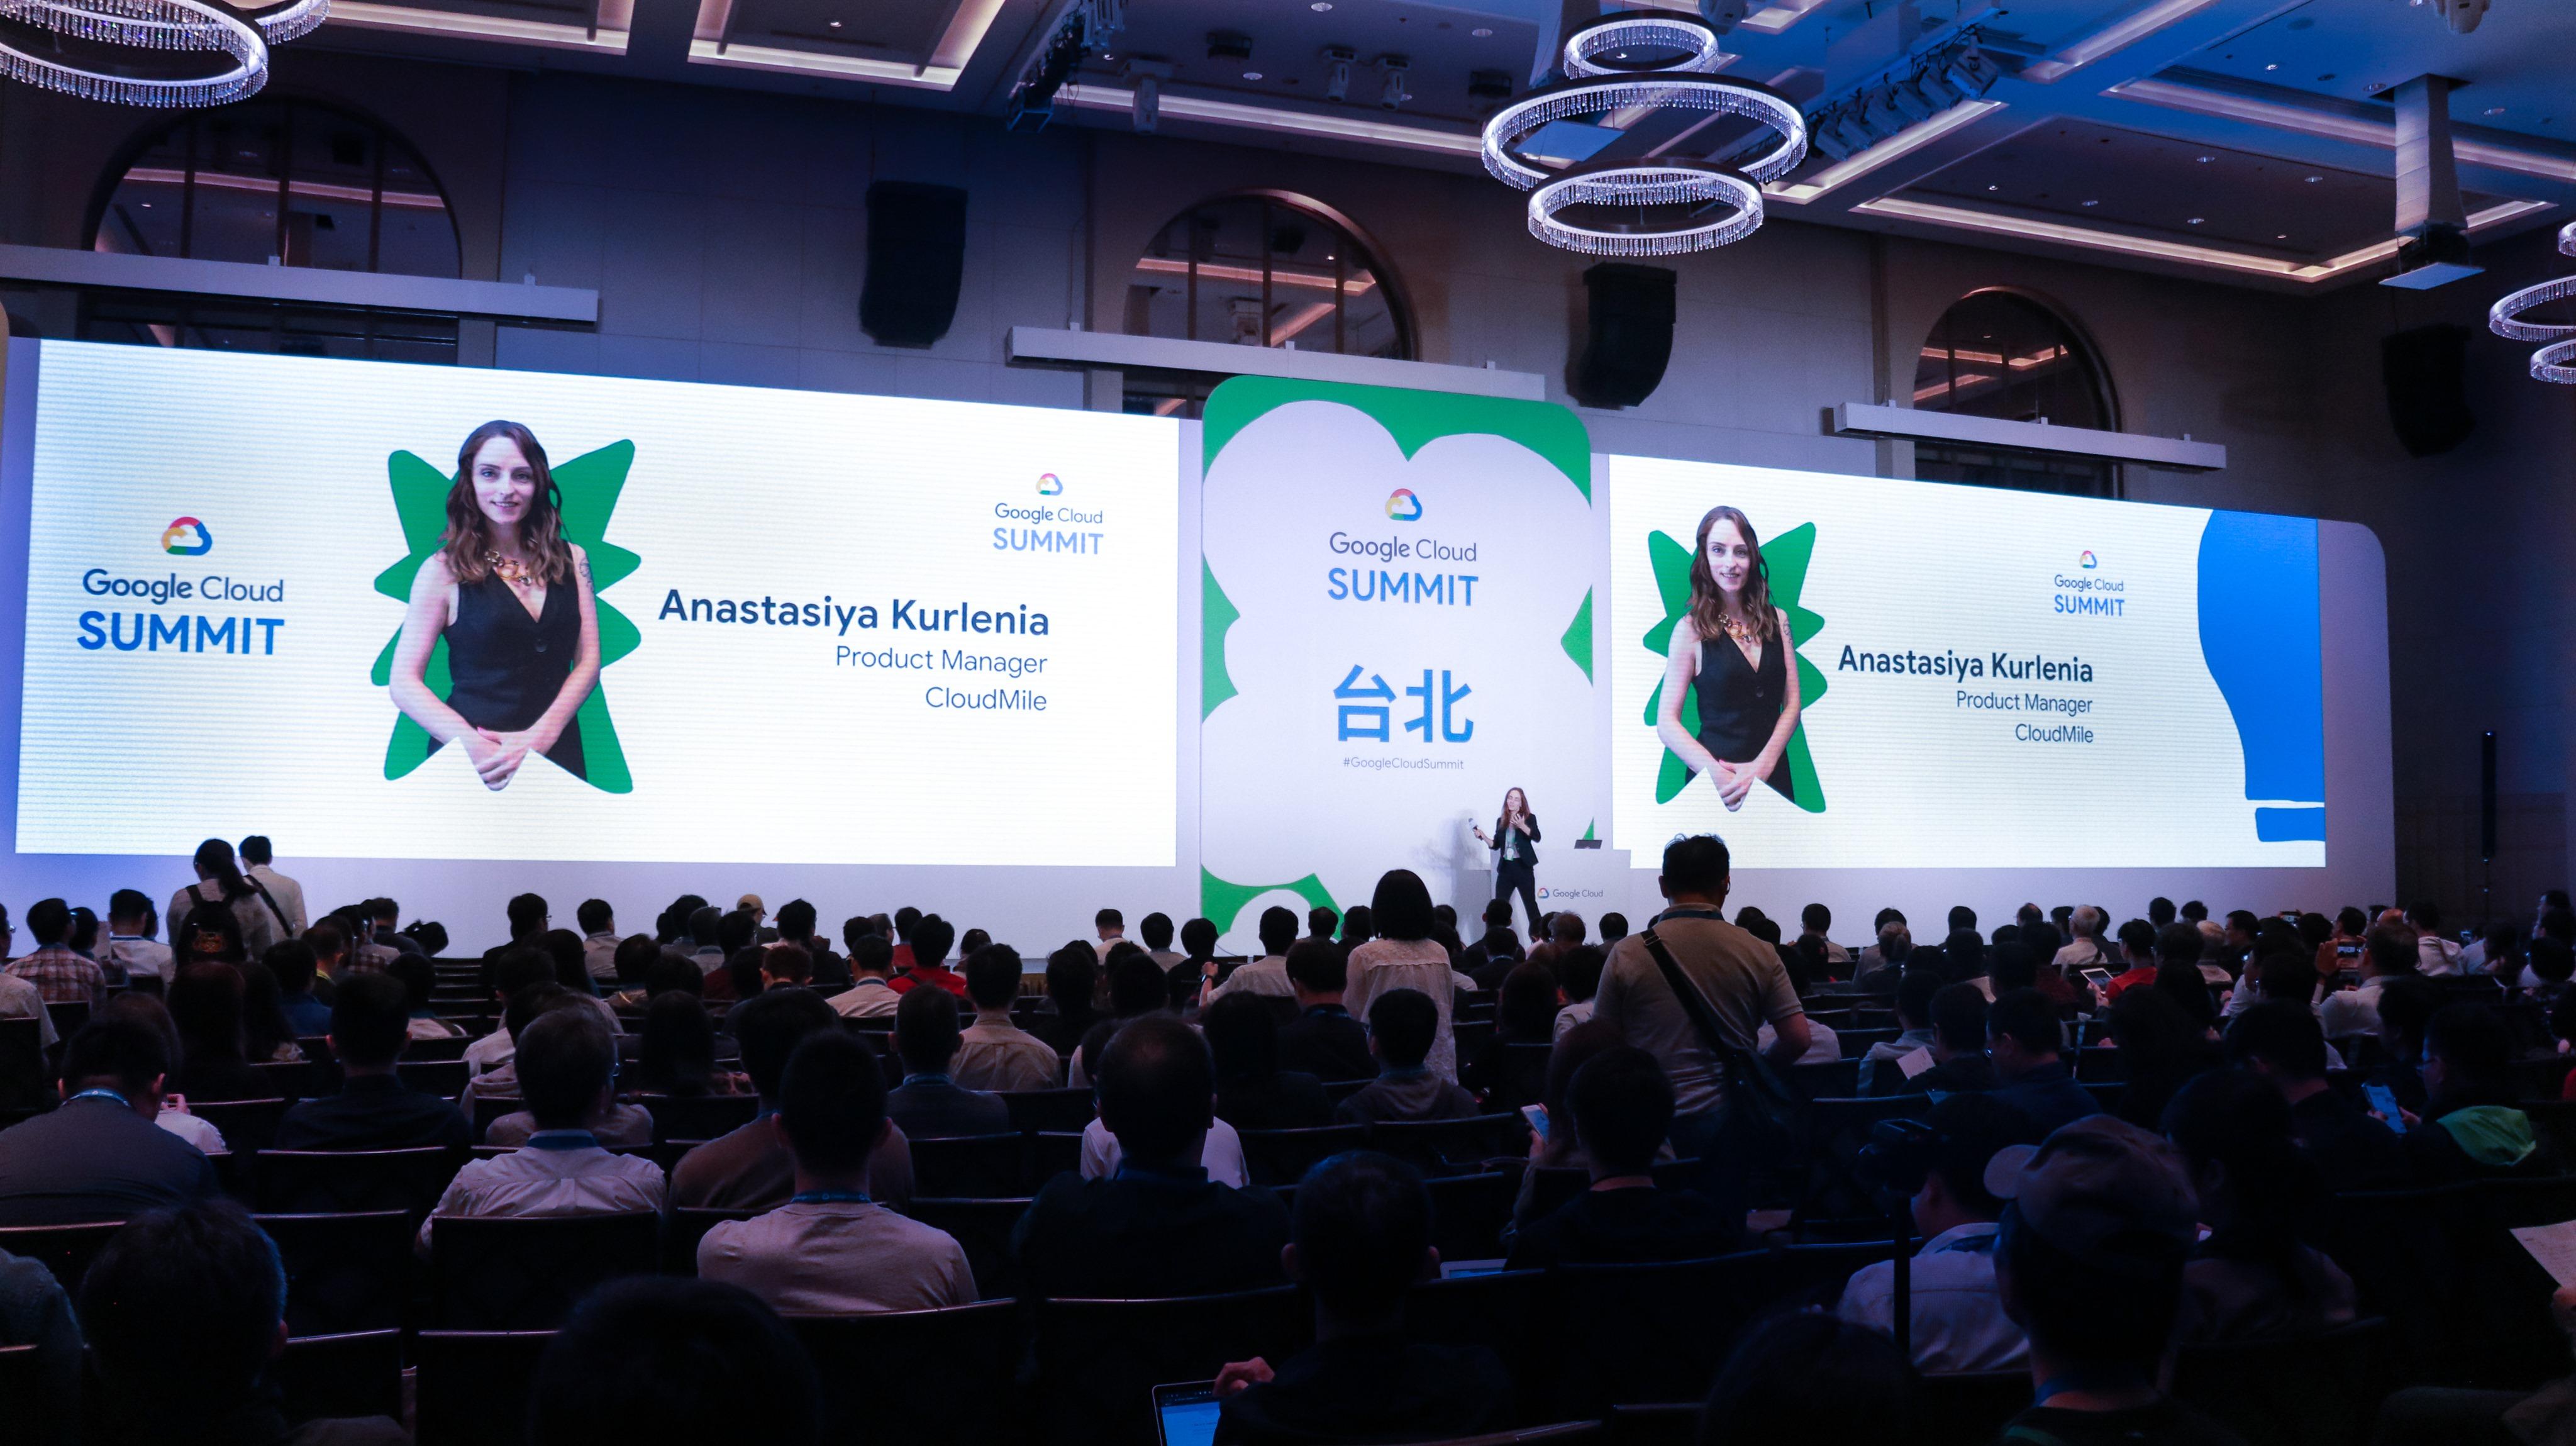 Google cloud Summit 2019 Taipei-CloudMile Session